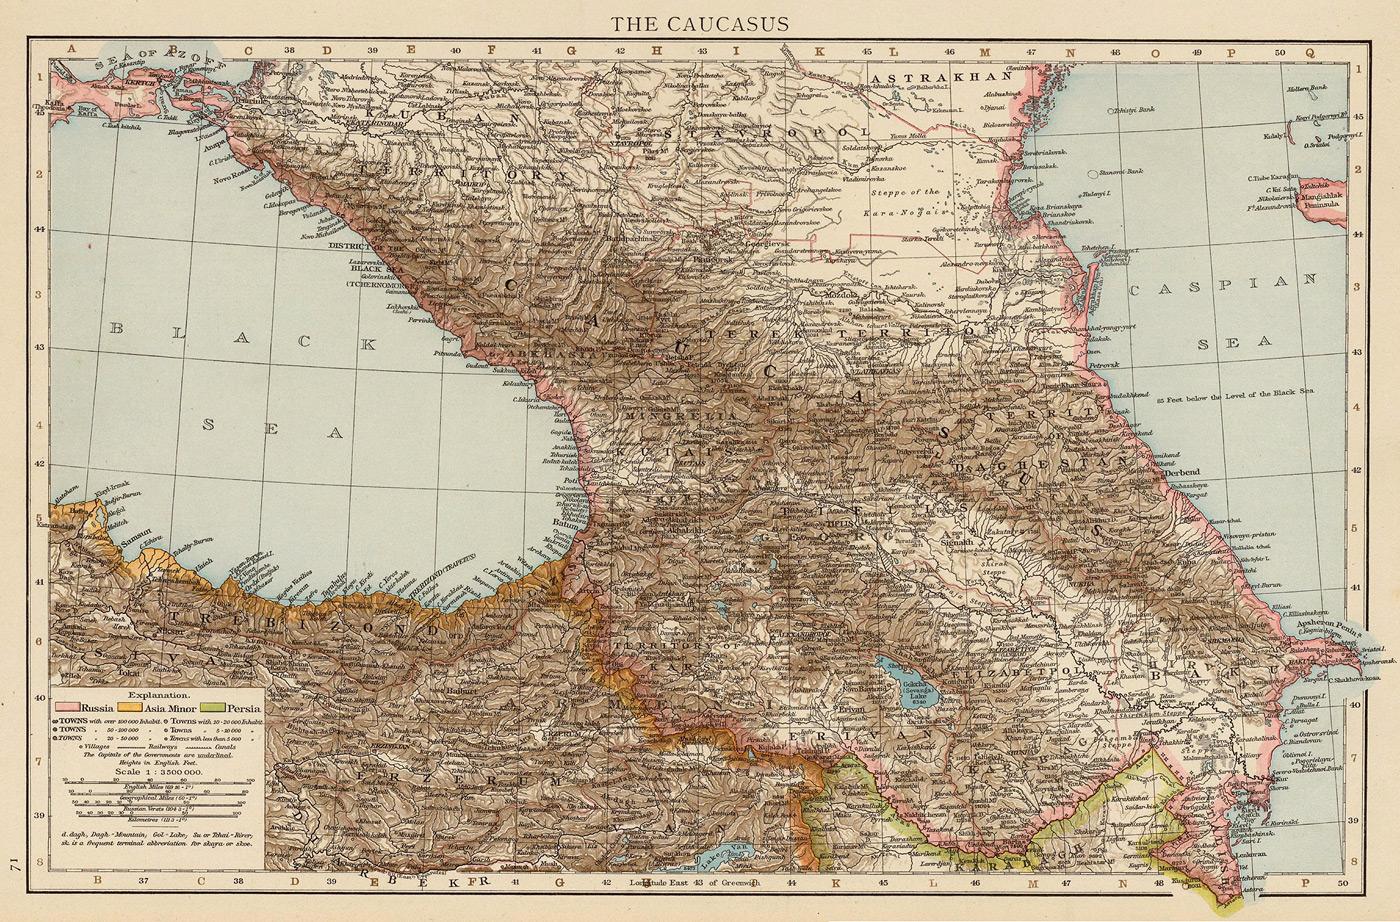 NagornoKarabakh Maps - Caucasus map